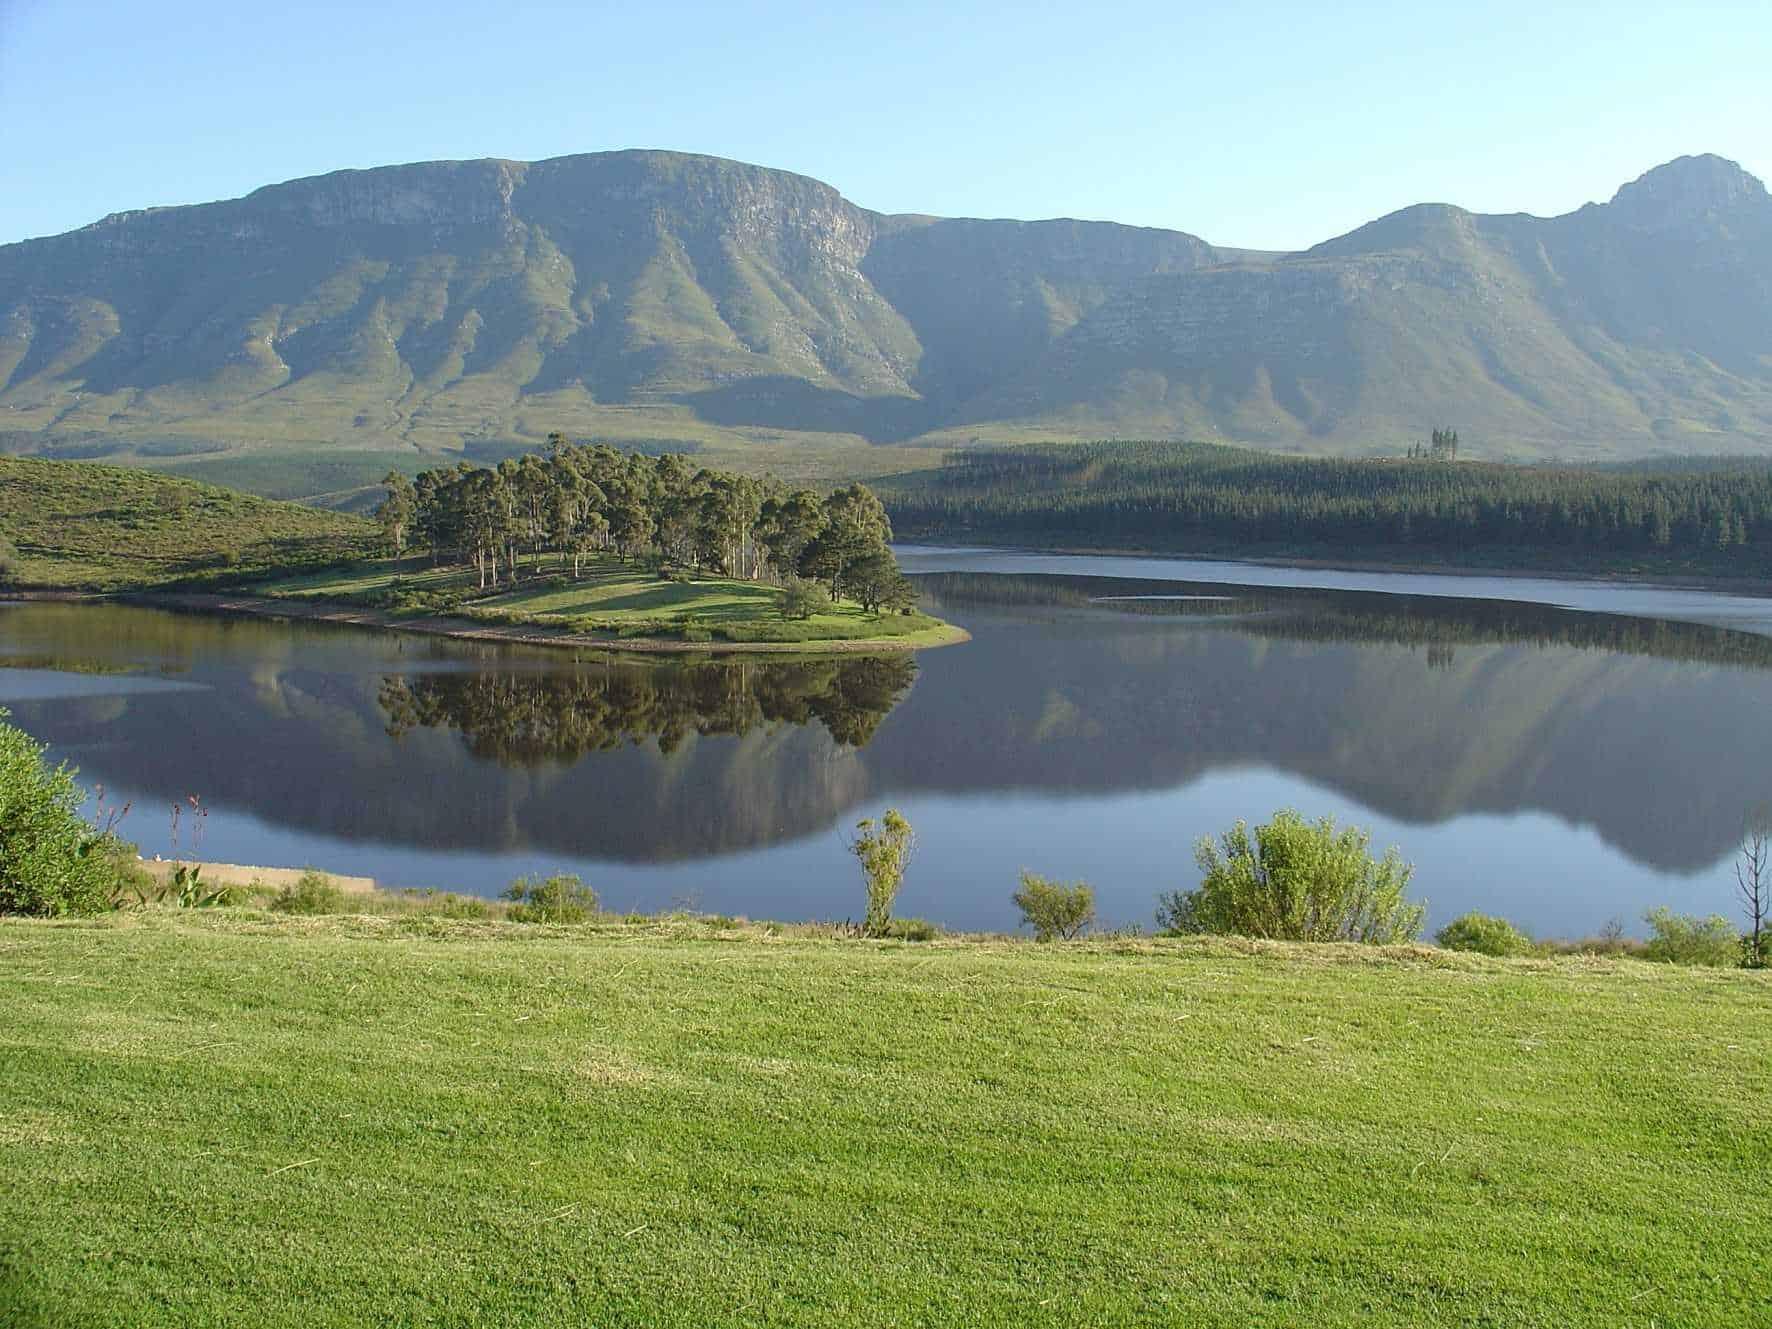 Riversdal Korente Dam